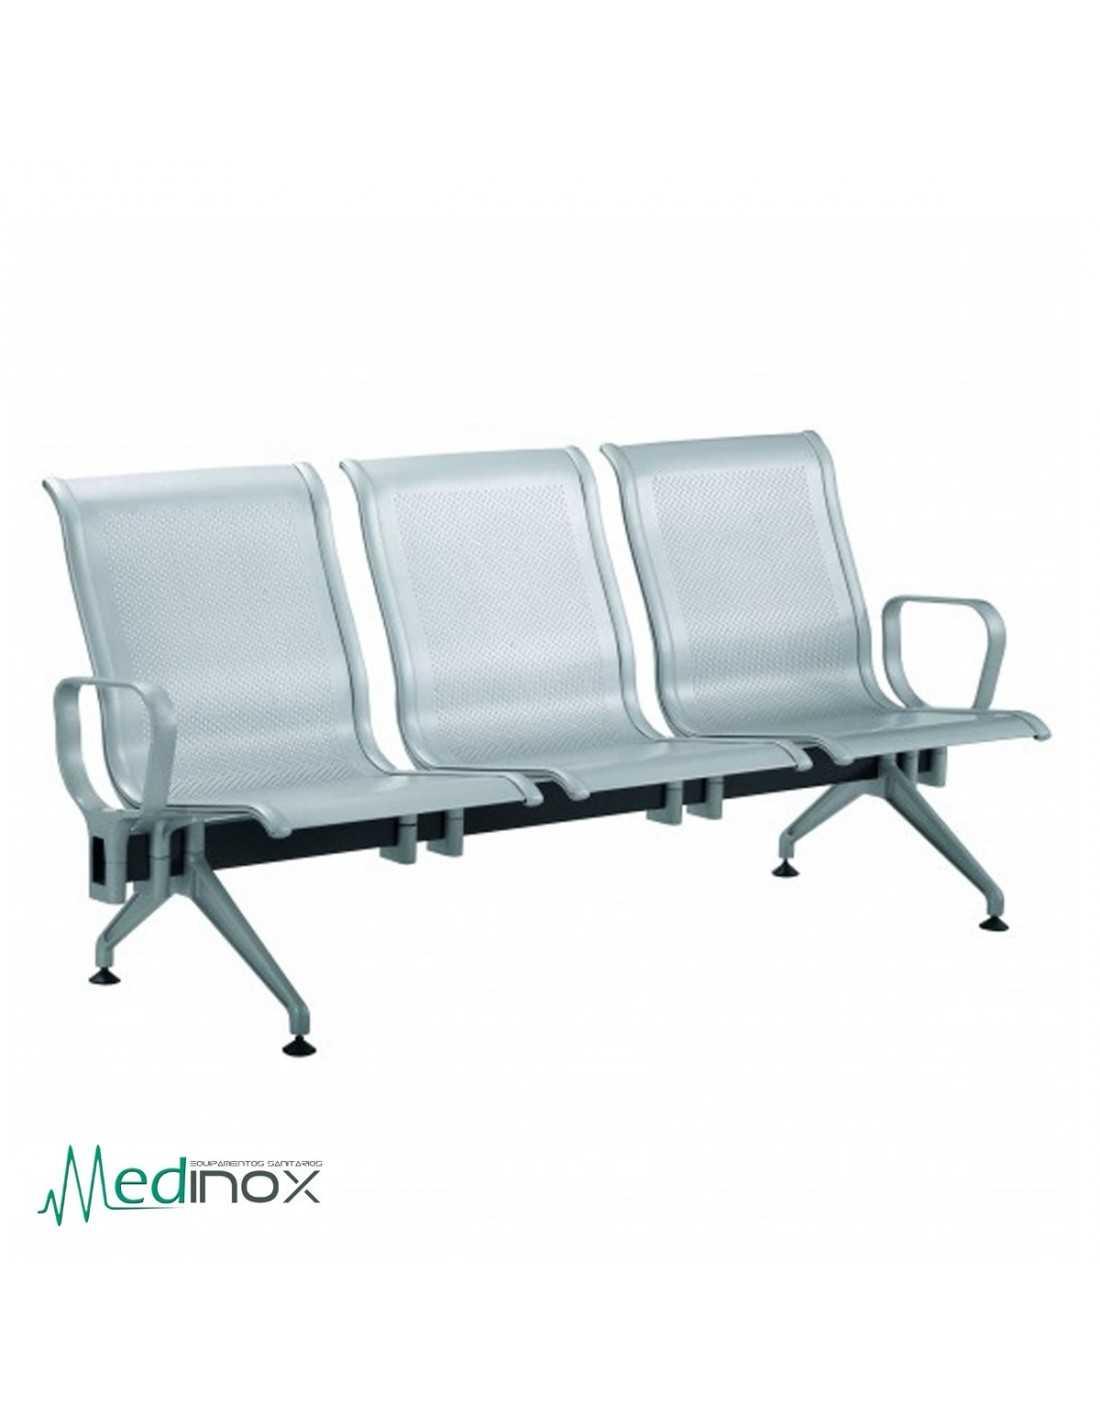 Sillas sala espera rljava3 bancada 3 sillas de espera en for Sillas para la sala